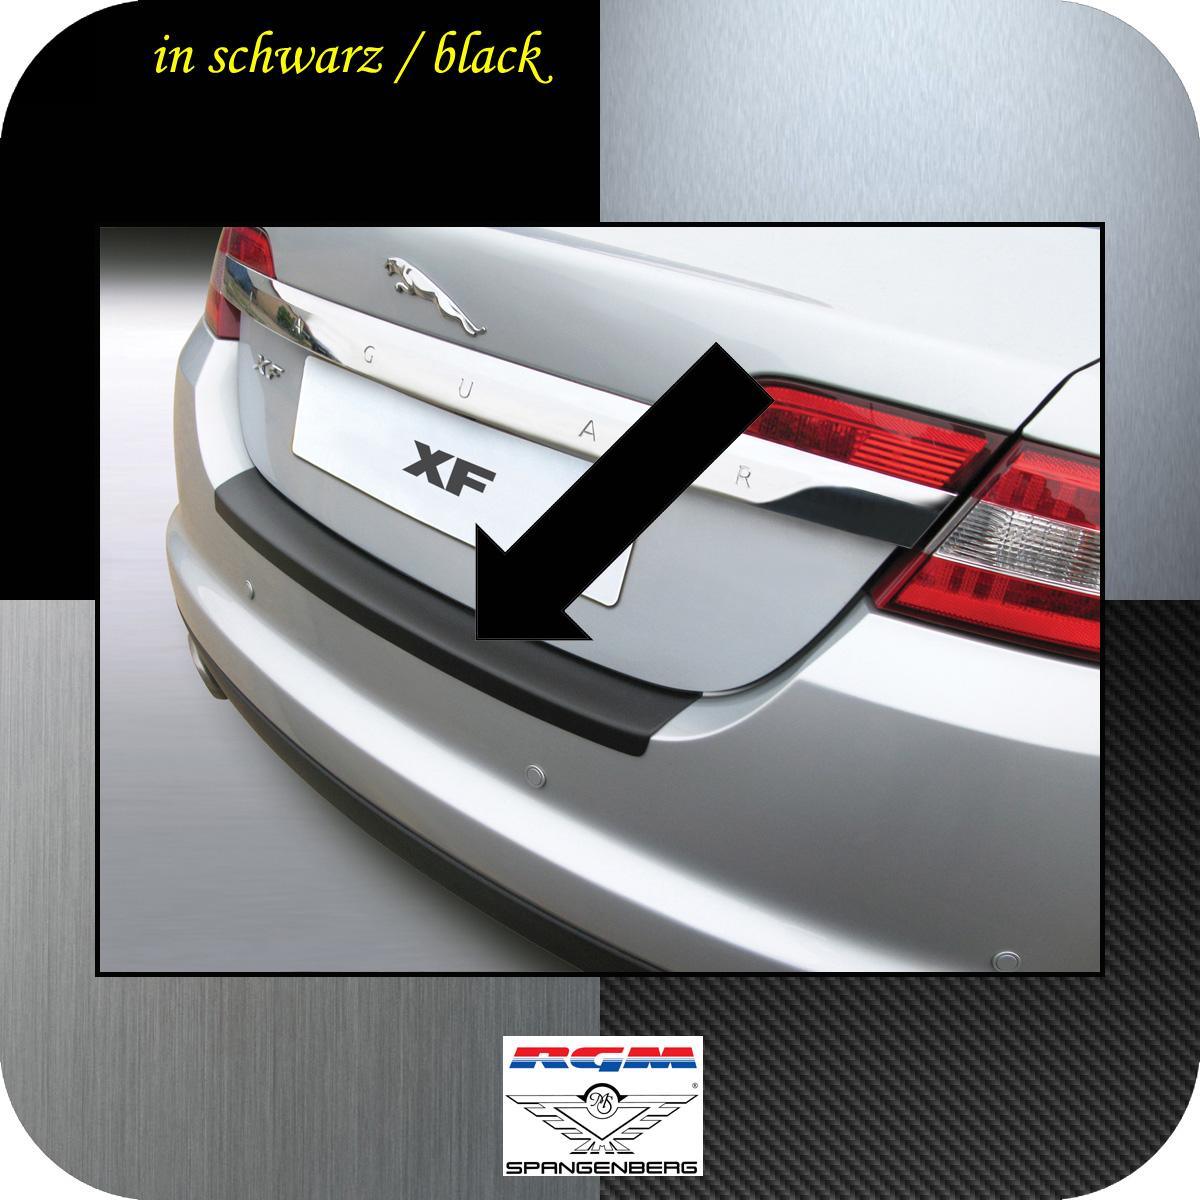 Ladekantenschutz schwarz Jaguar XF I X250 Limousine Baujahre 2008-15 3500392